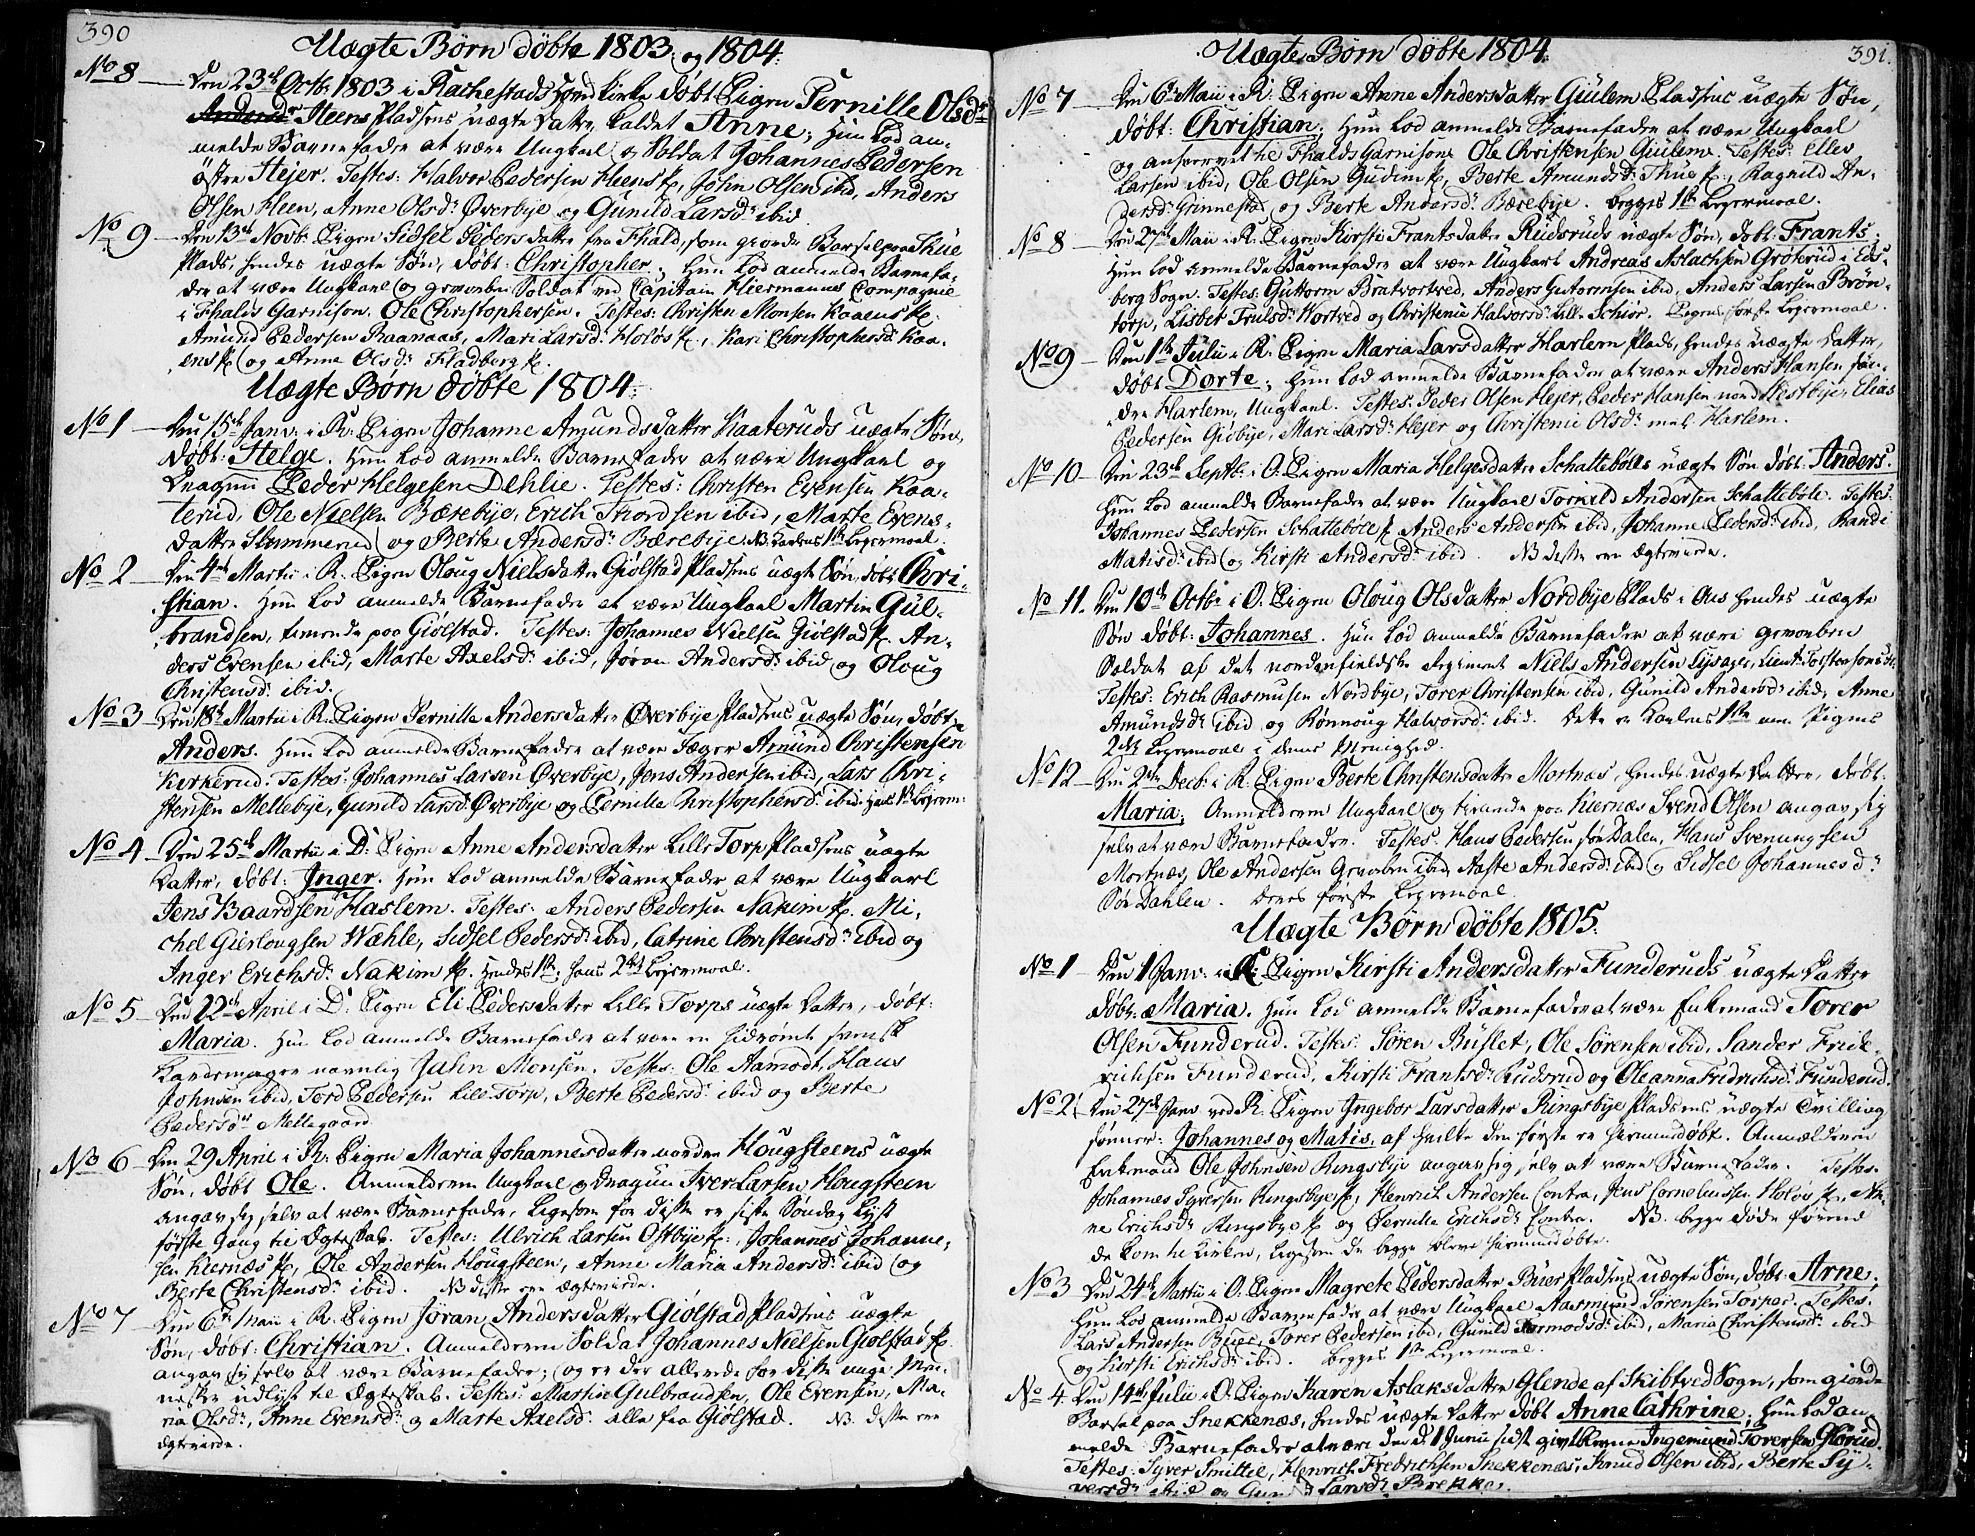 SAO, Rakkestad prestekontor Kirkebøker, F/Fa/L0005: Ministerialbok nr. I 5, 1784-1814, s. 390-391